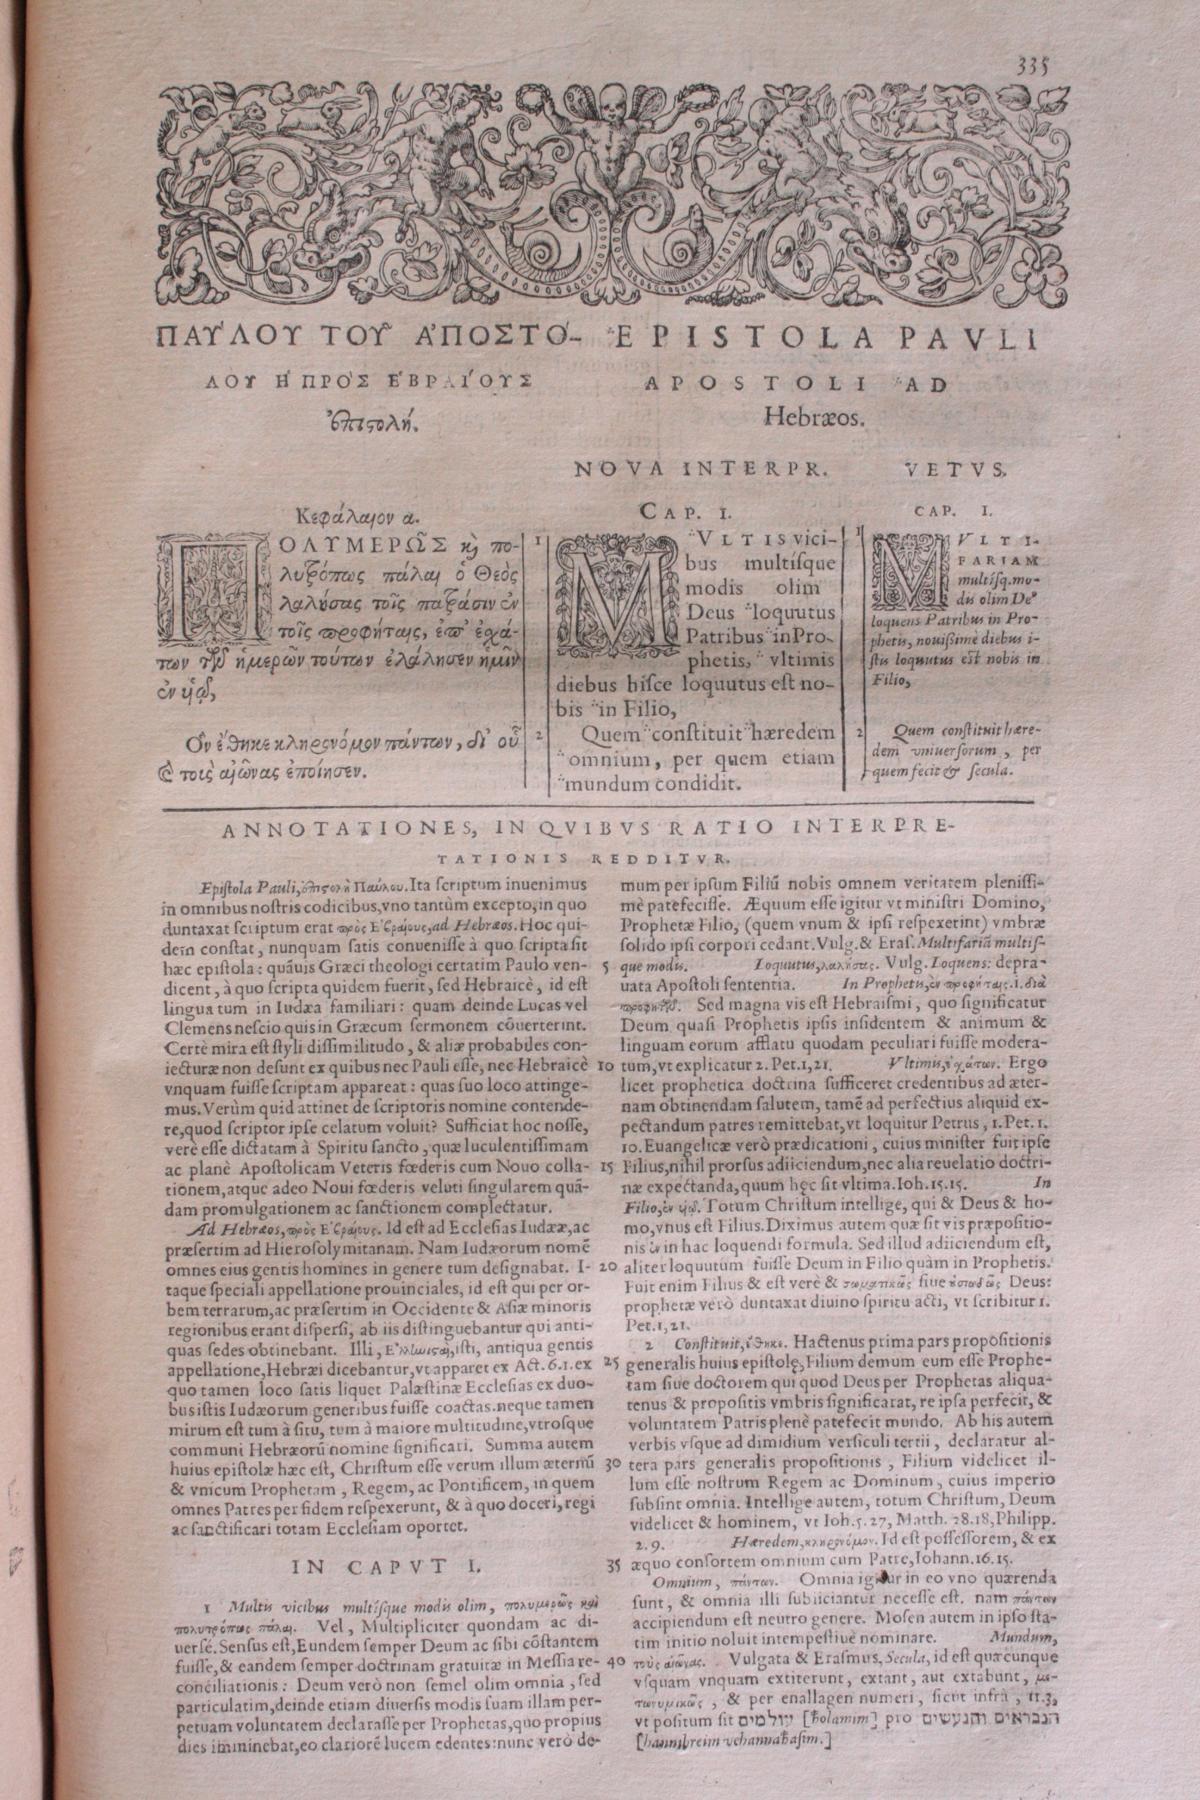 Griechische-Lateinische Bibel, Novum Testamentum 1582-15